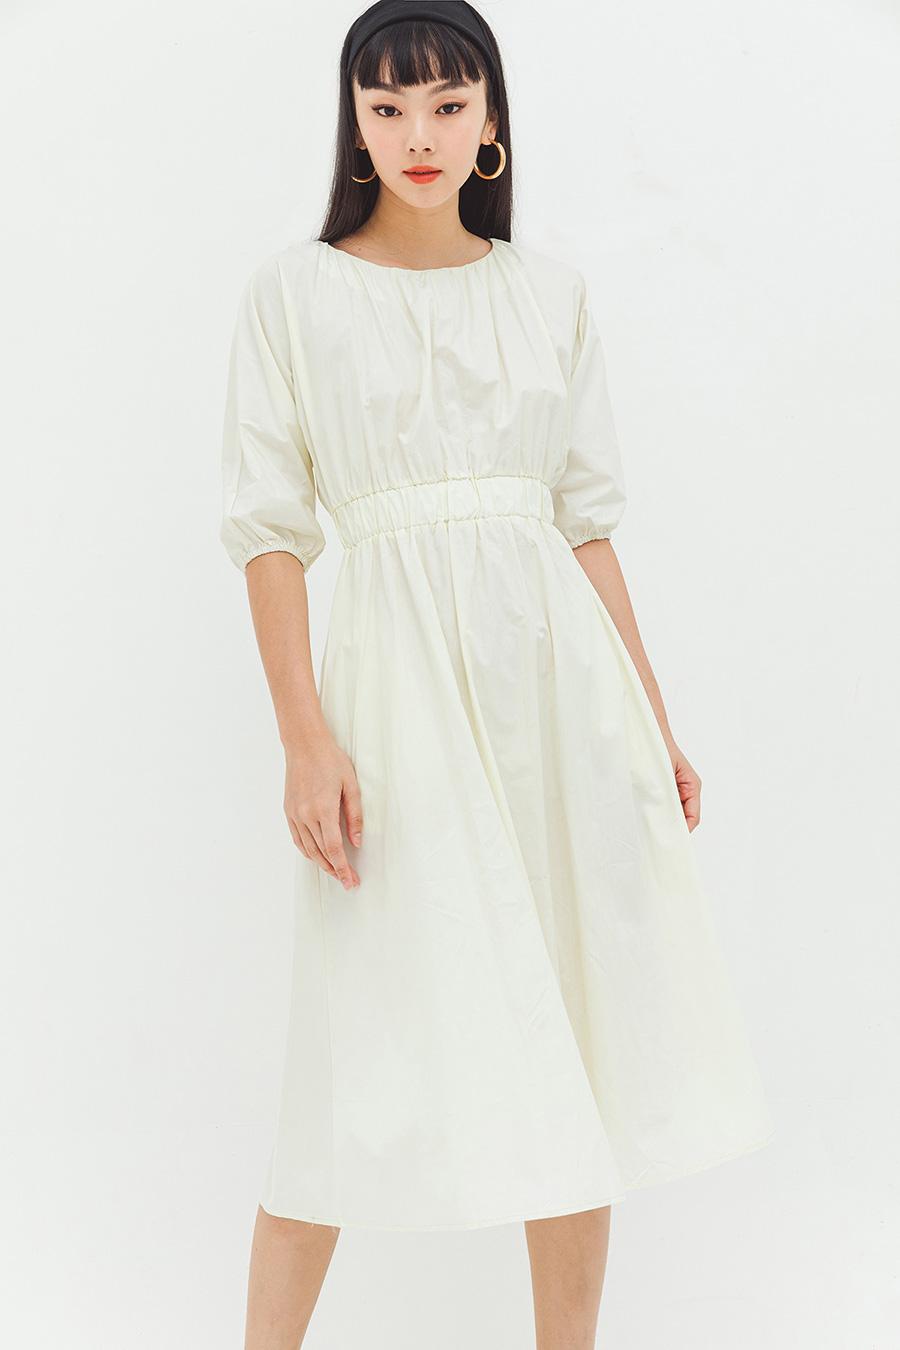 MARTINE DRESS - VANILLA